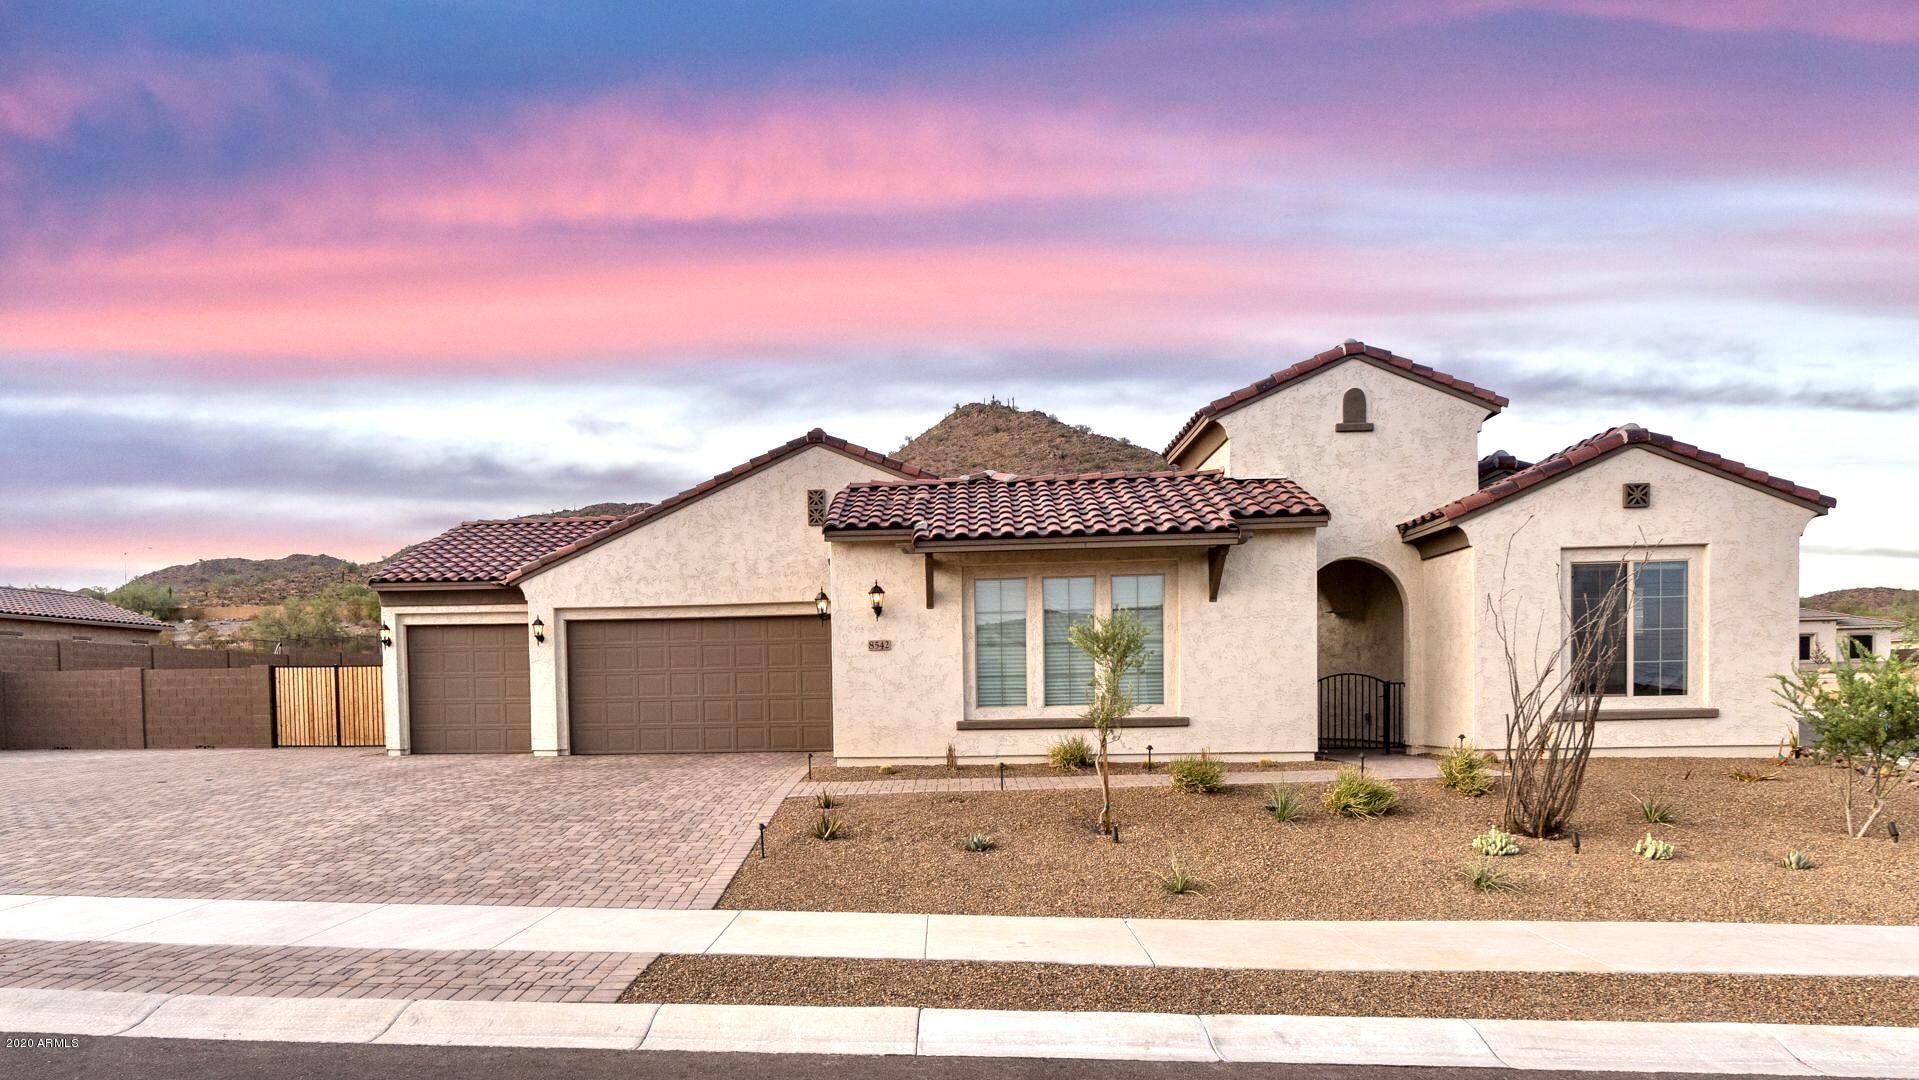 8542 W ARTEMISA Avenue, Peoria, AZ 85383 - #: 6130988